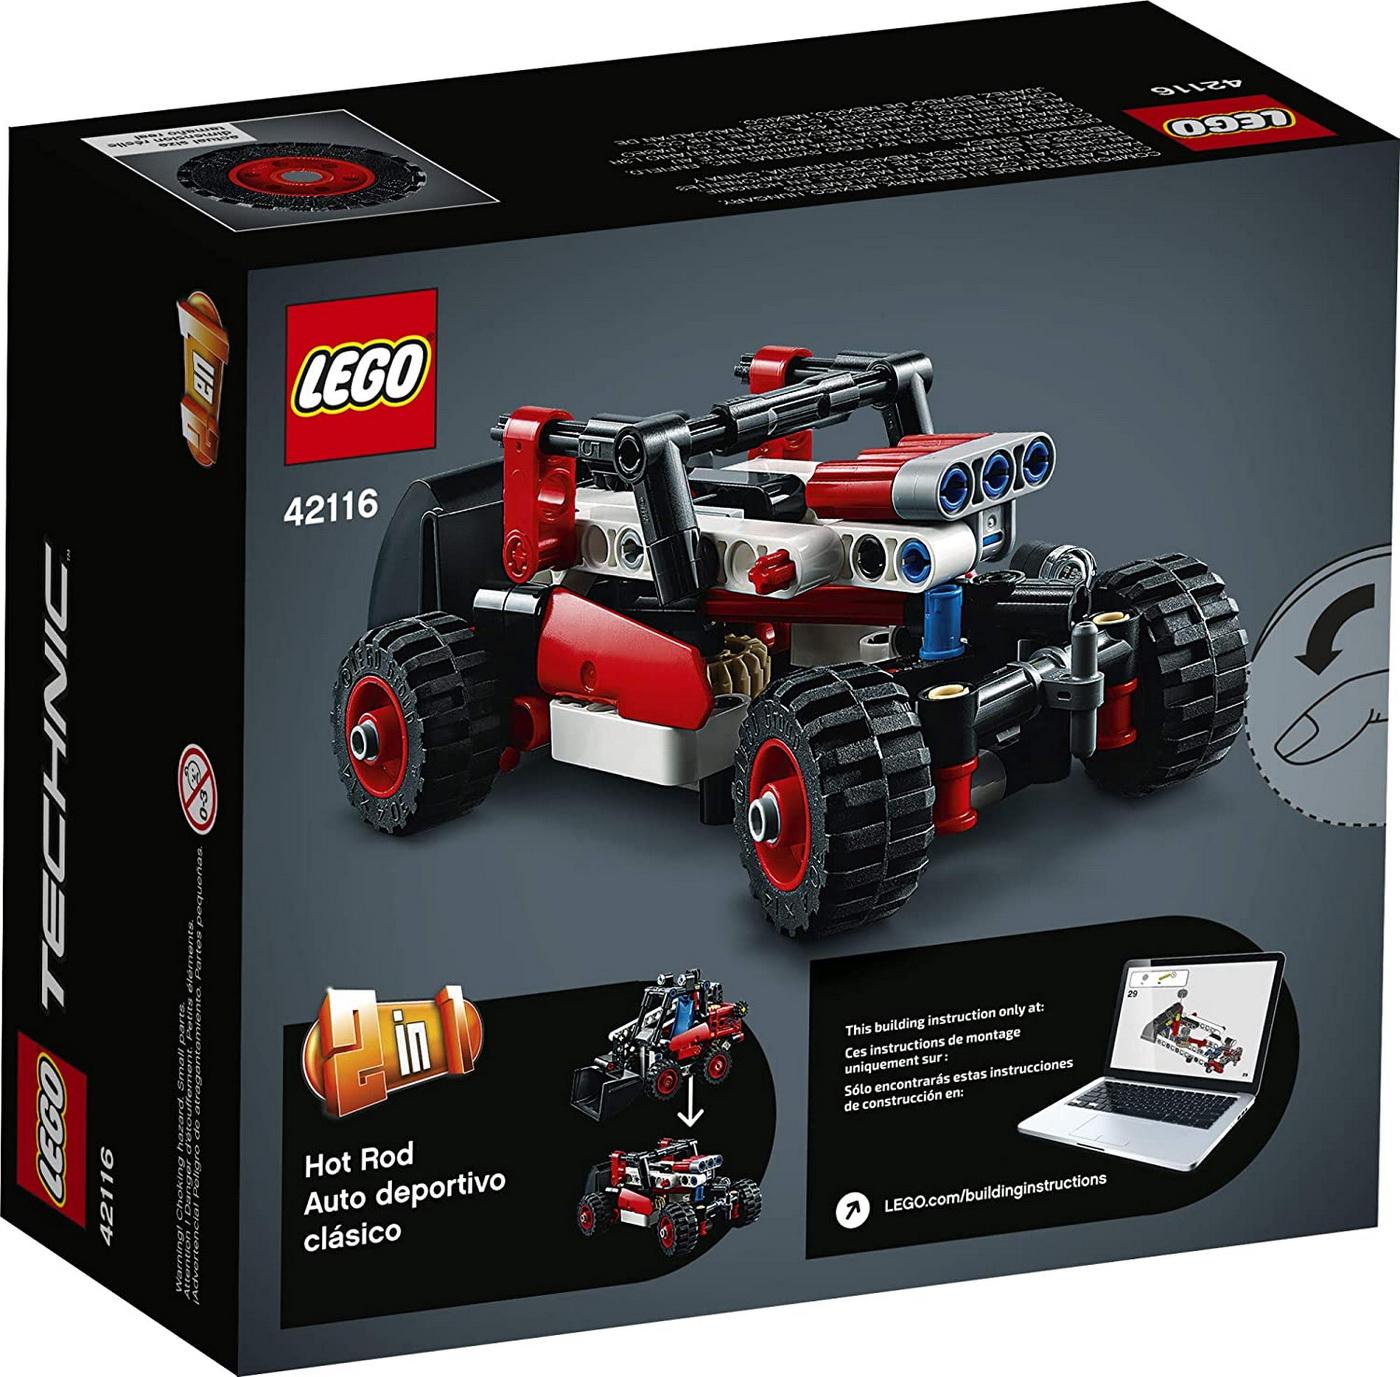 LEGO Technic - Skid Steer Loader (42116)   LEGO - 7